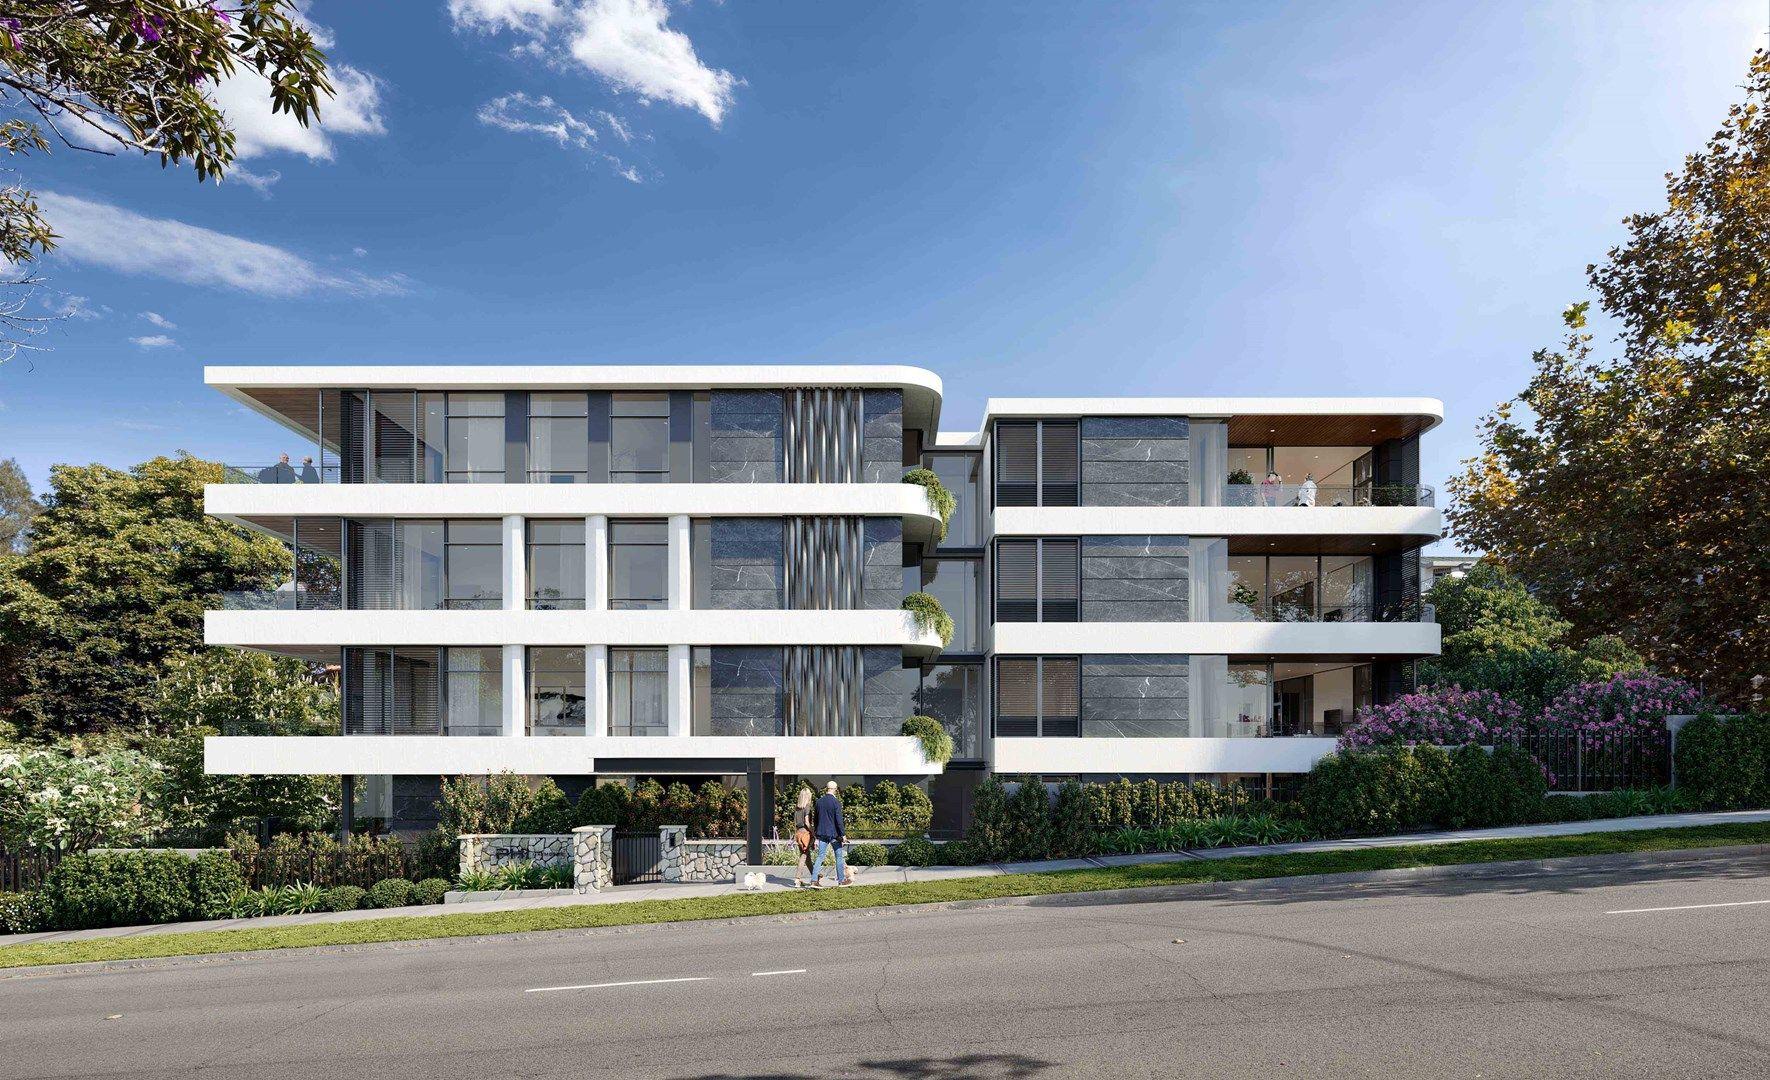 98 Spofforth Street, Cremorne, NSW 2090, Image 0